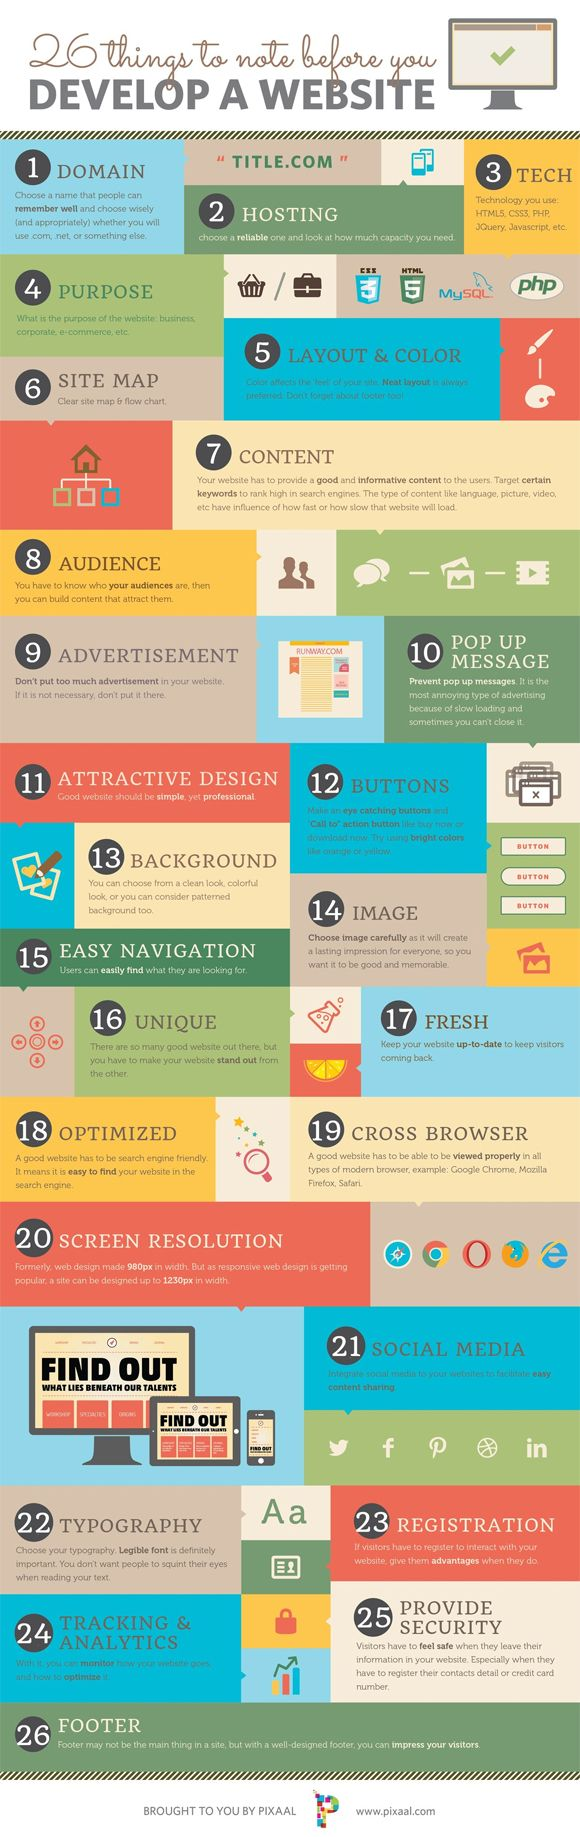 20 Useful Web Design Infographics Tips Tricks Web Design Tips Web Design Web Development